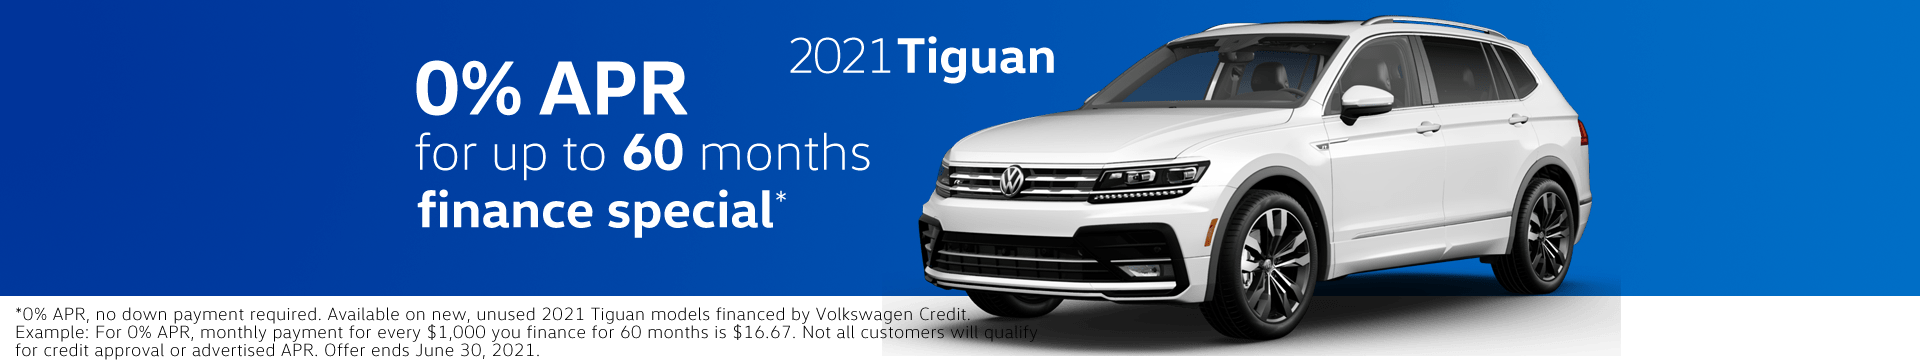 VW Tiguan Special